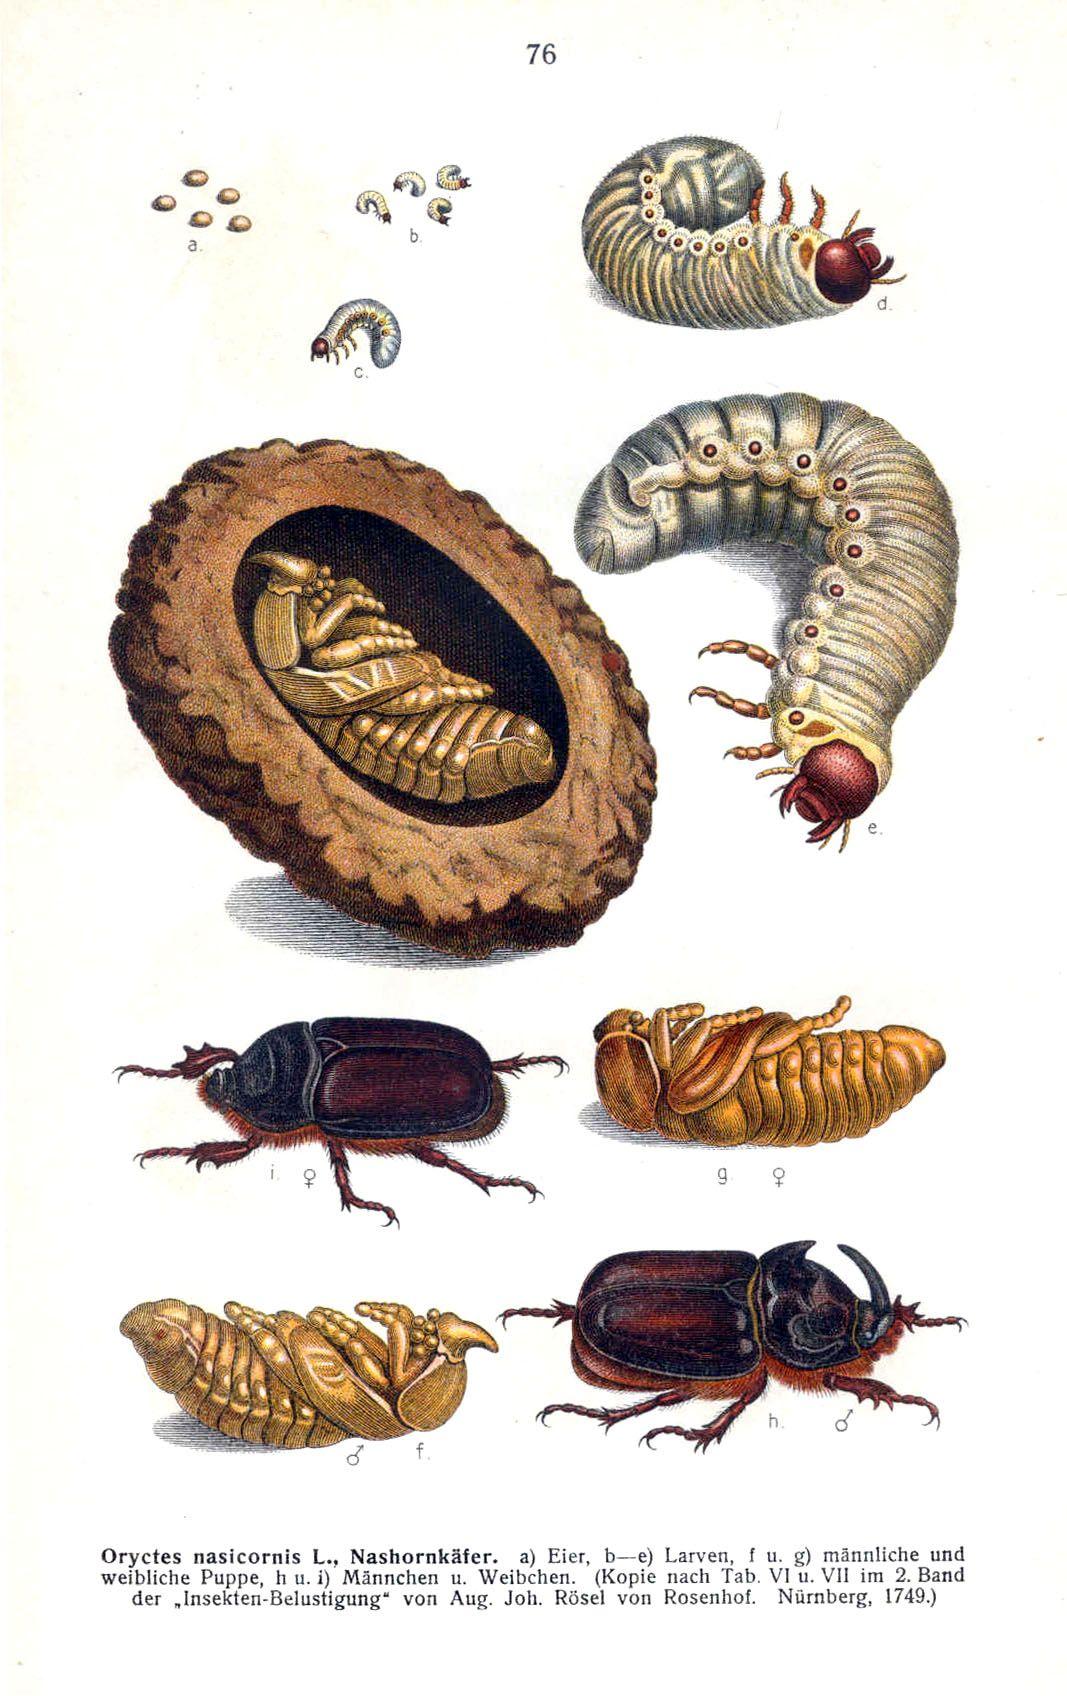 Rhinoceros Beetle Life Cycle | Life science unit | Pinterest ...